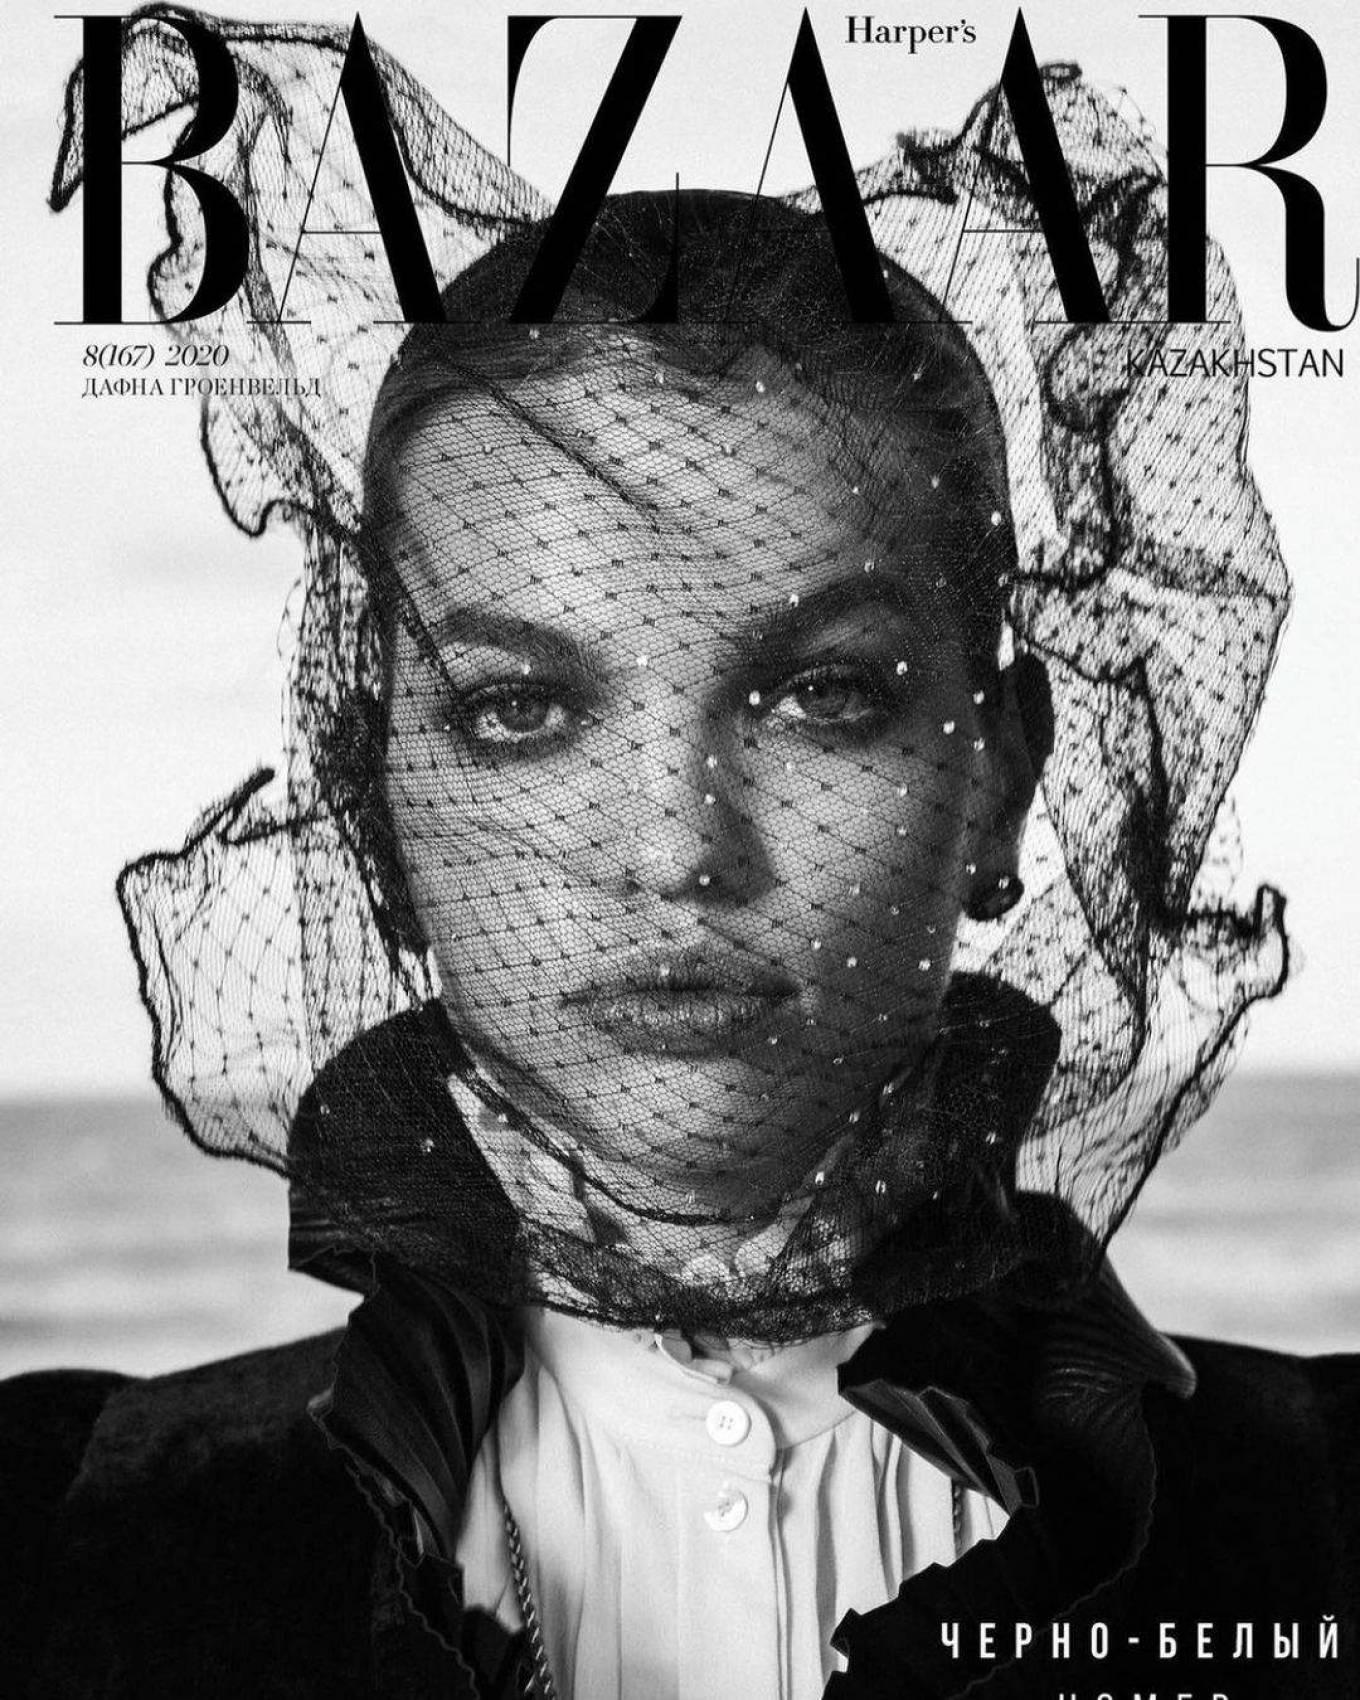 Daphne Groeneveld - Harper's Bazaar (Russia - November 2020)